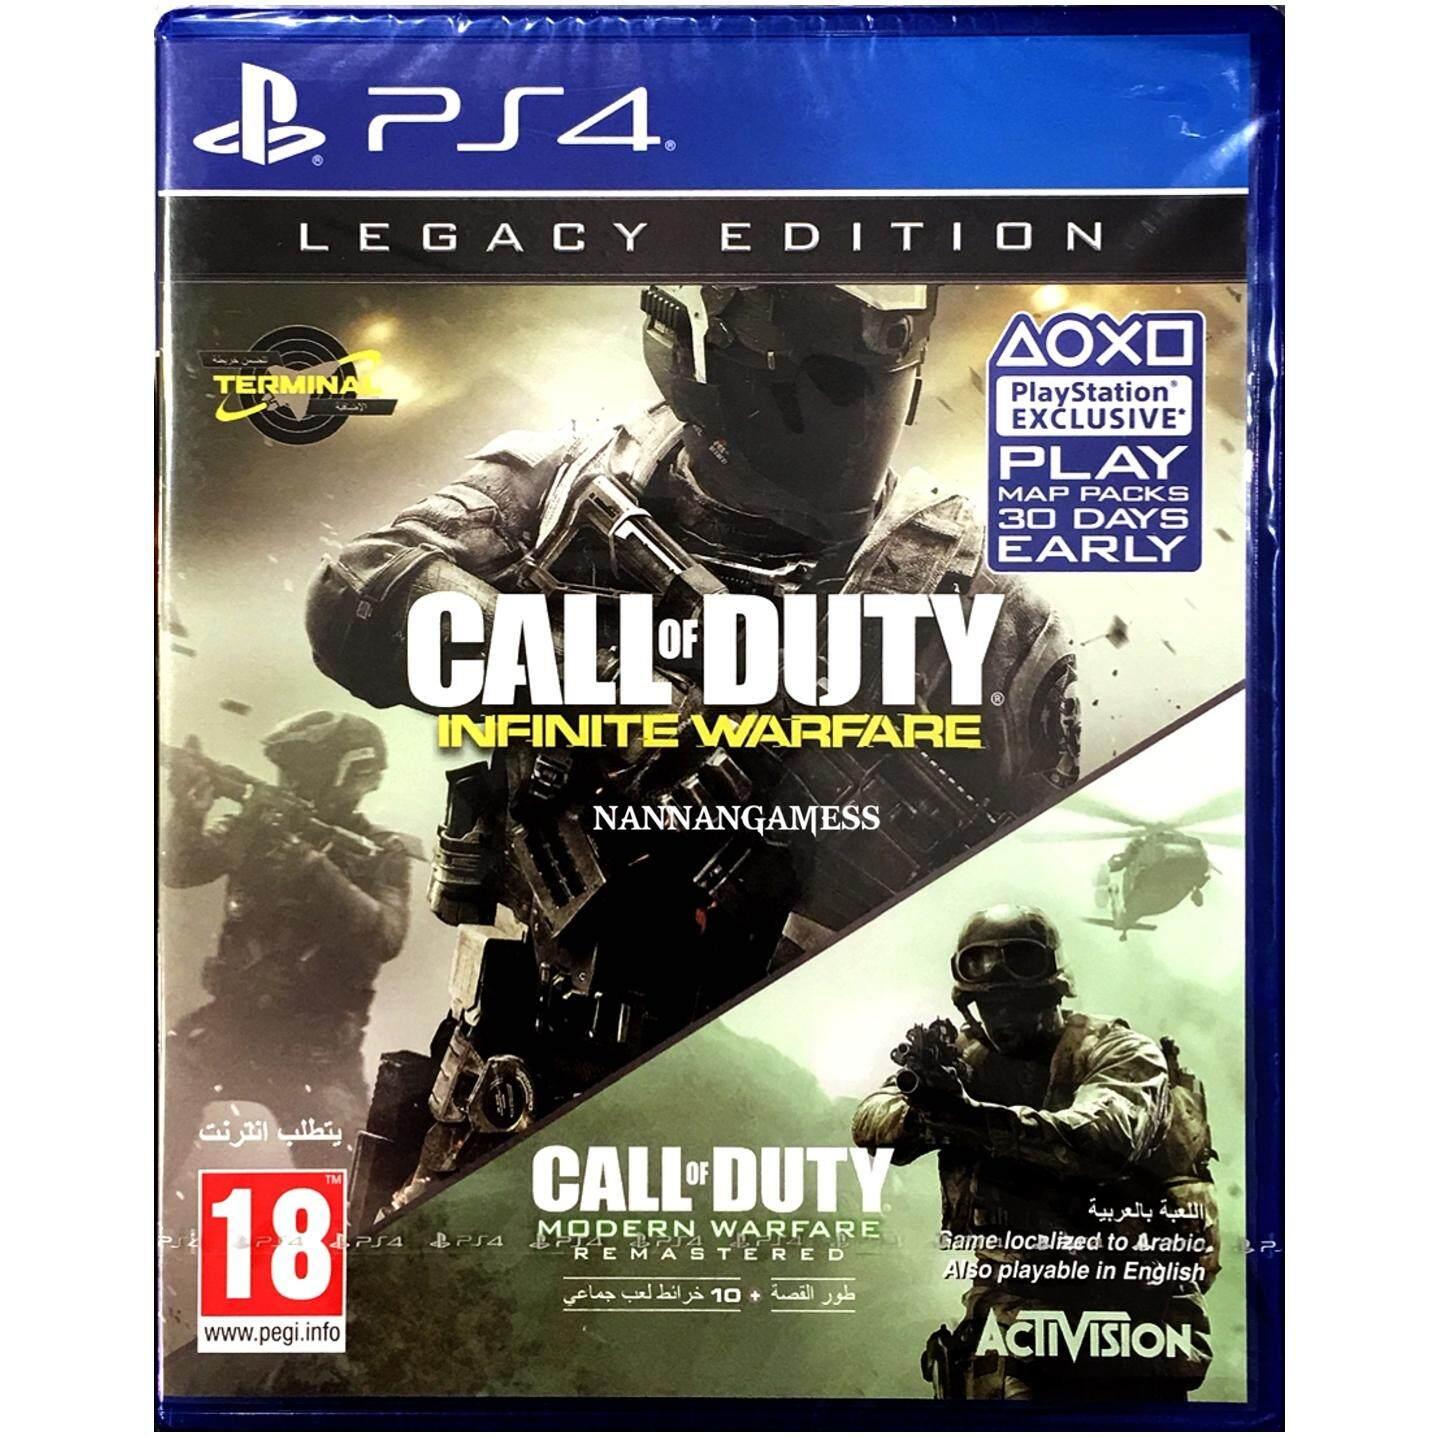 PS4 Call of Duty Infinite Warfare Legacy Edition ( Zone 2 )( English )